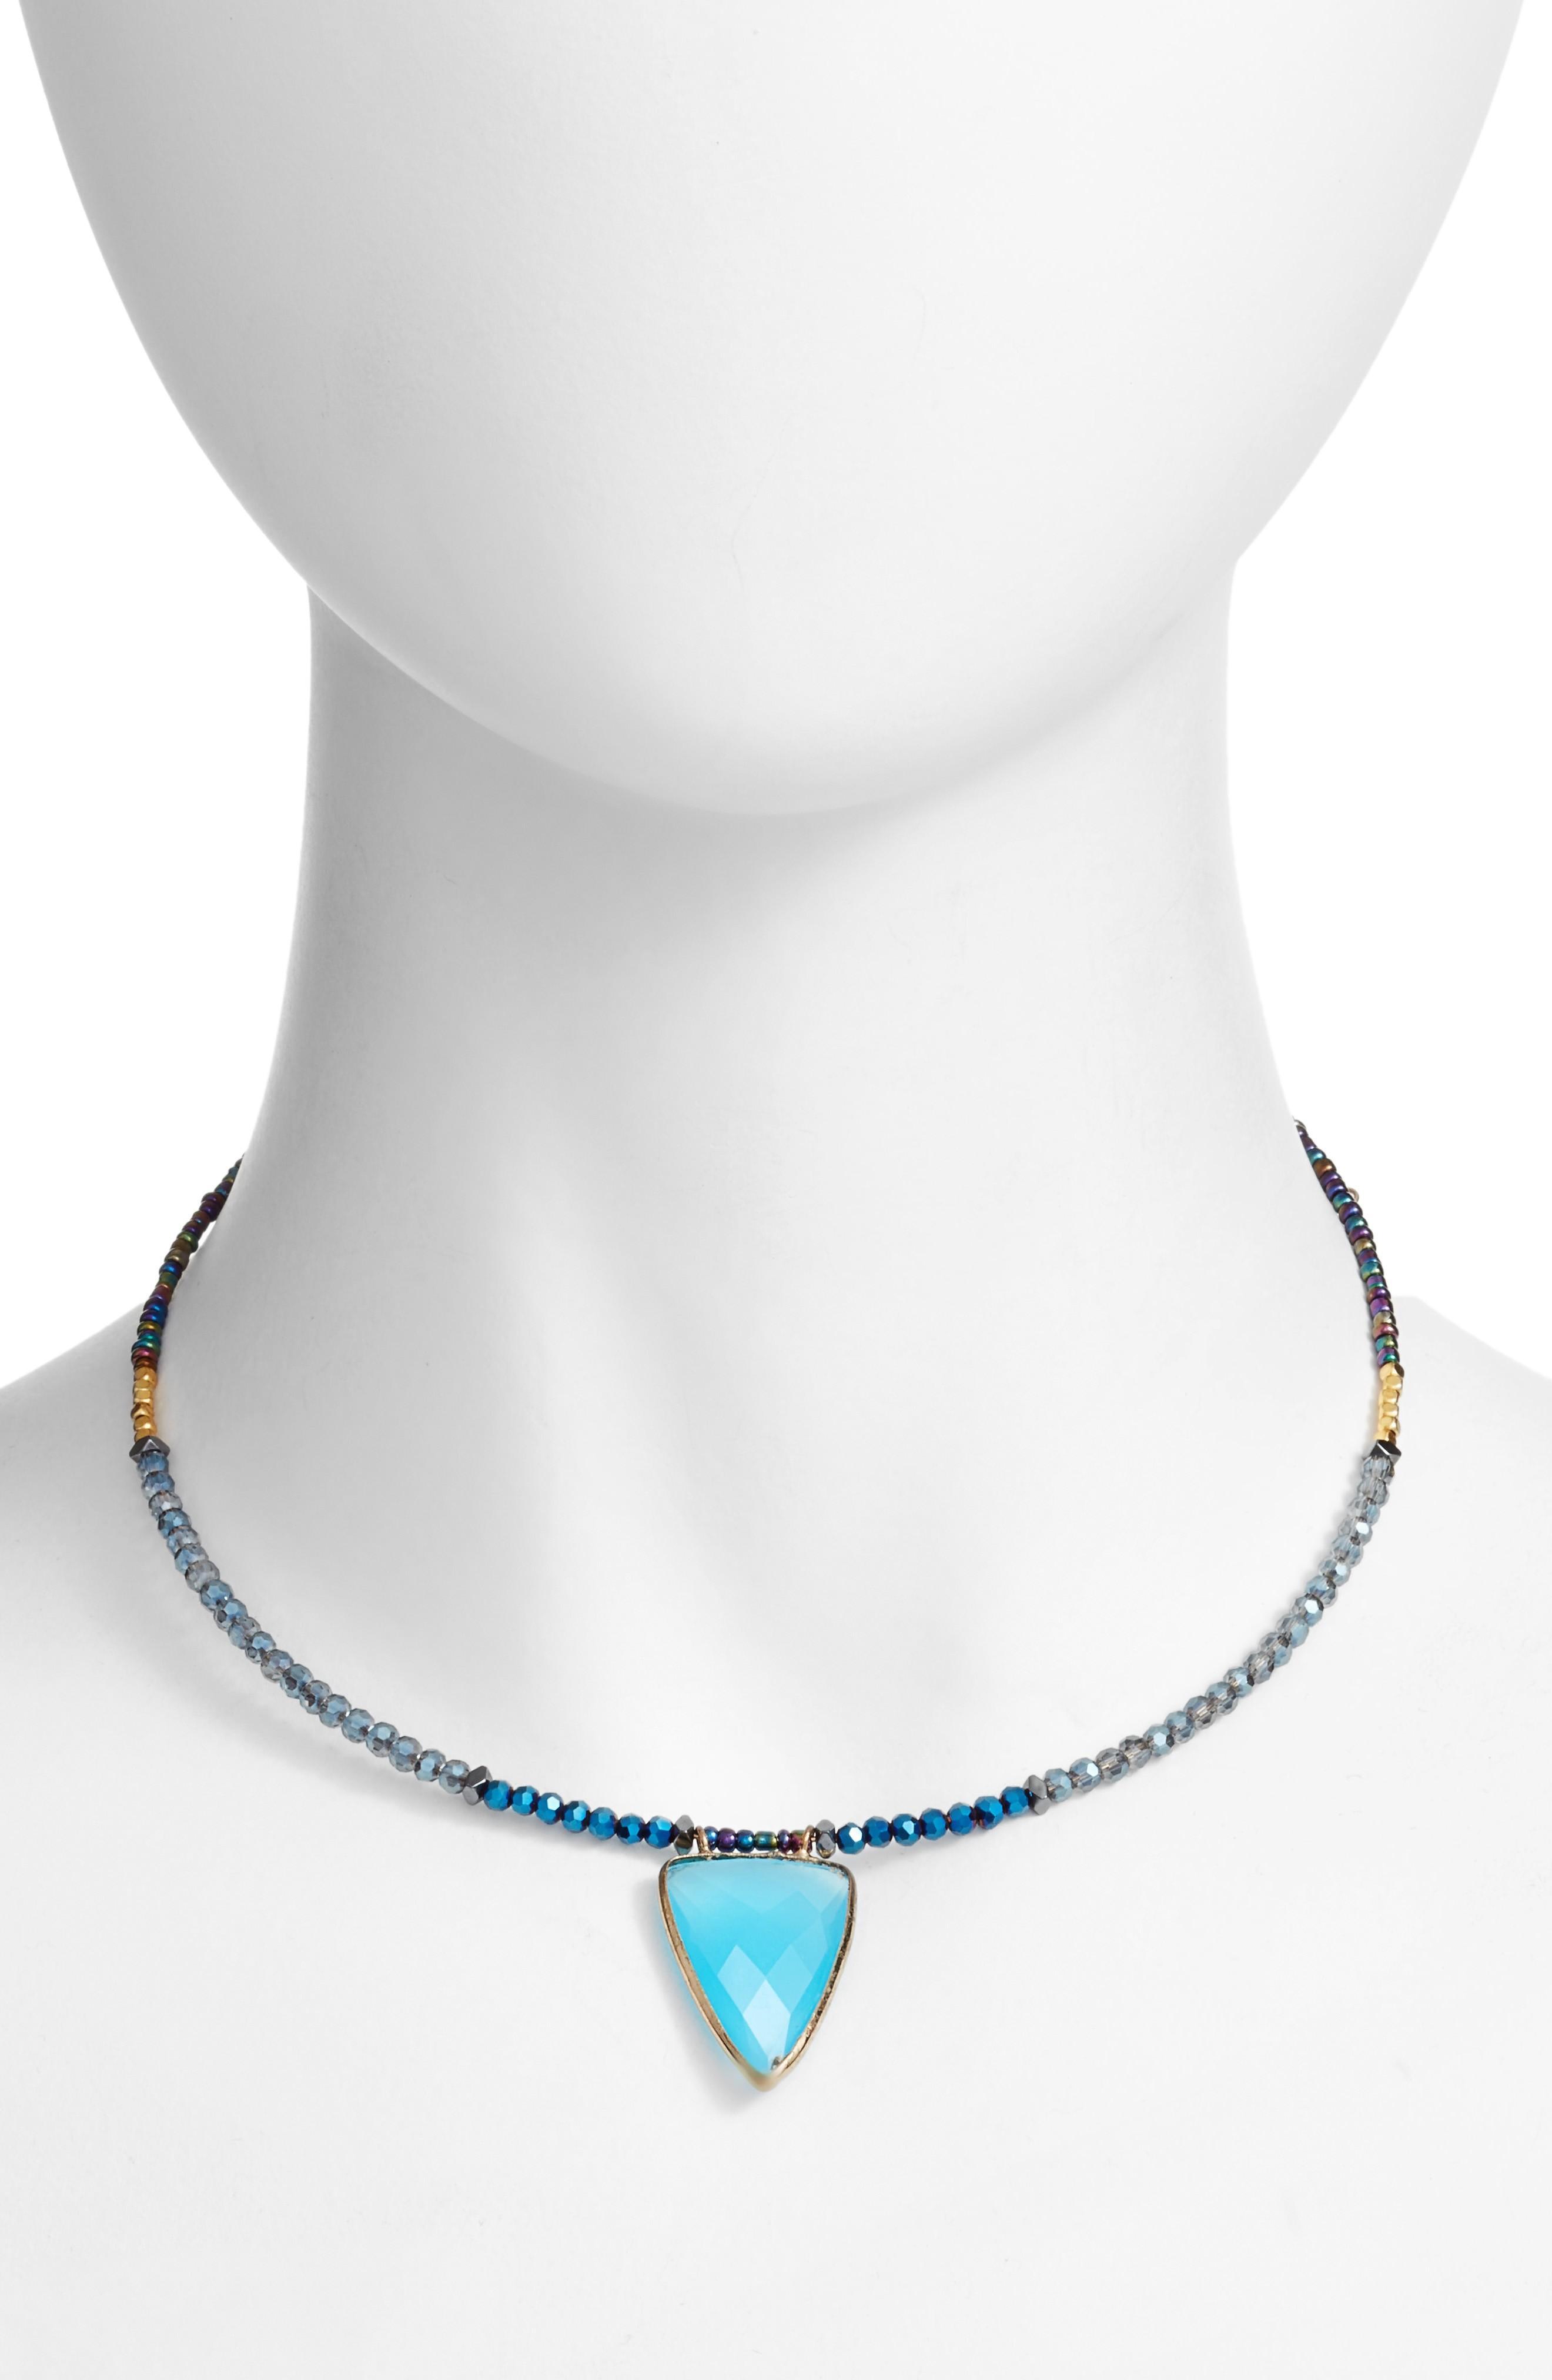 Elise M. Sarita Beaded Choker In Turquoise